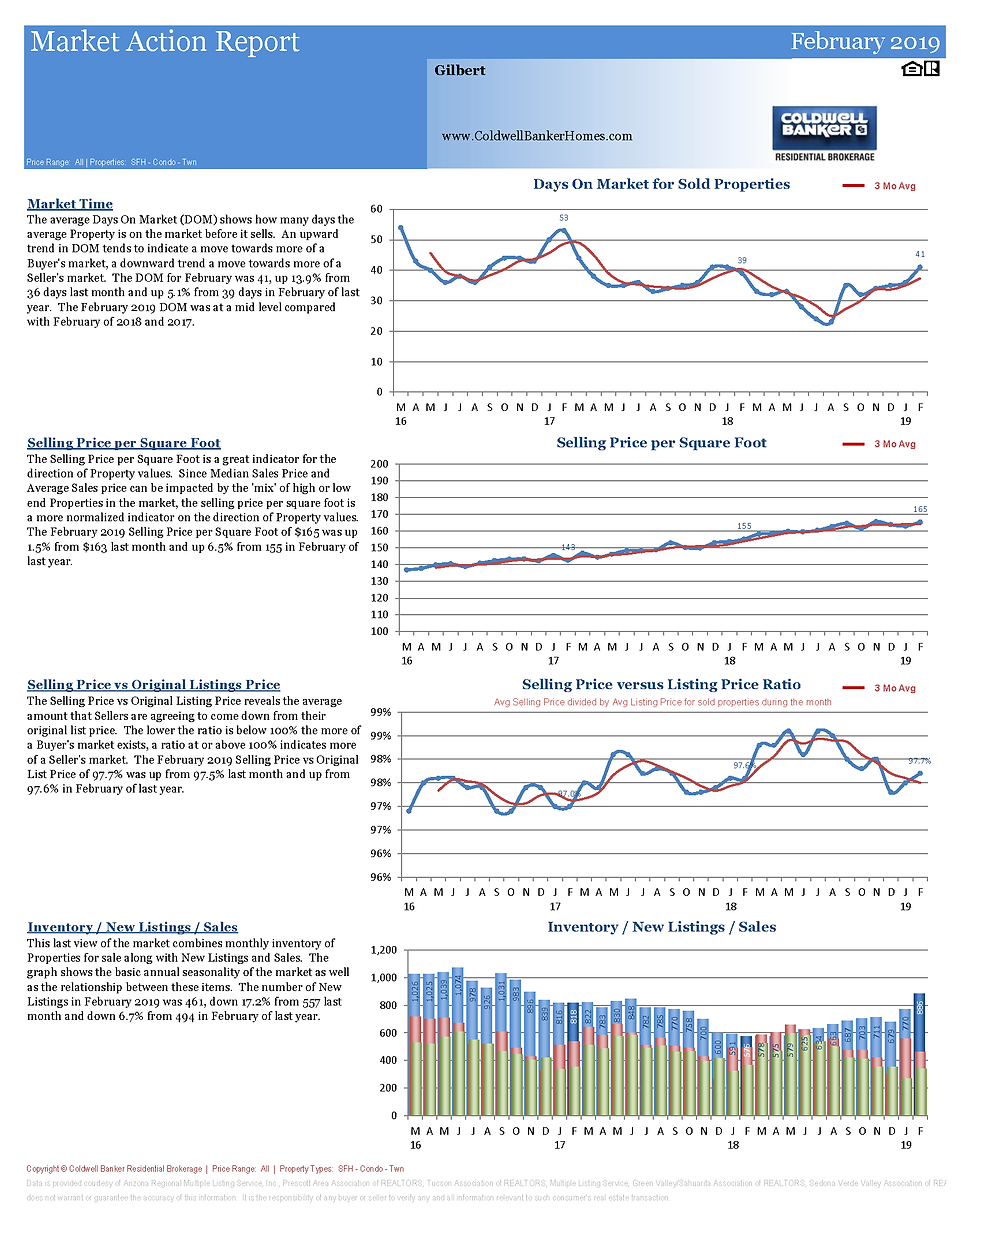 MarketActionReportGilbert_Page_2.png